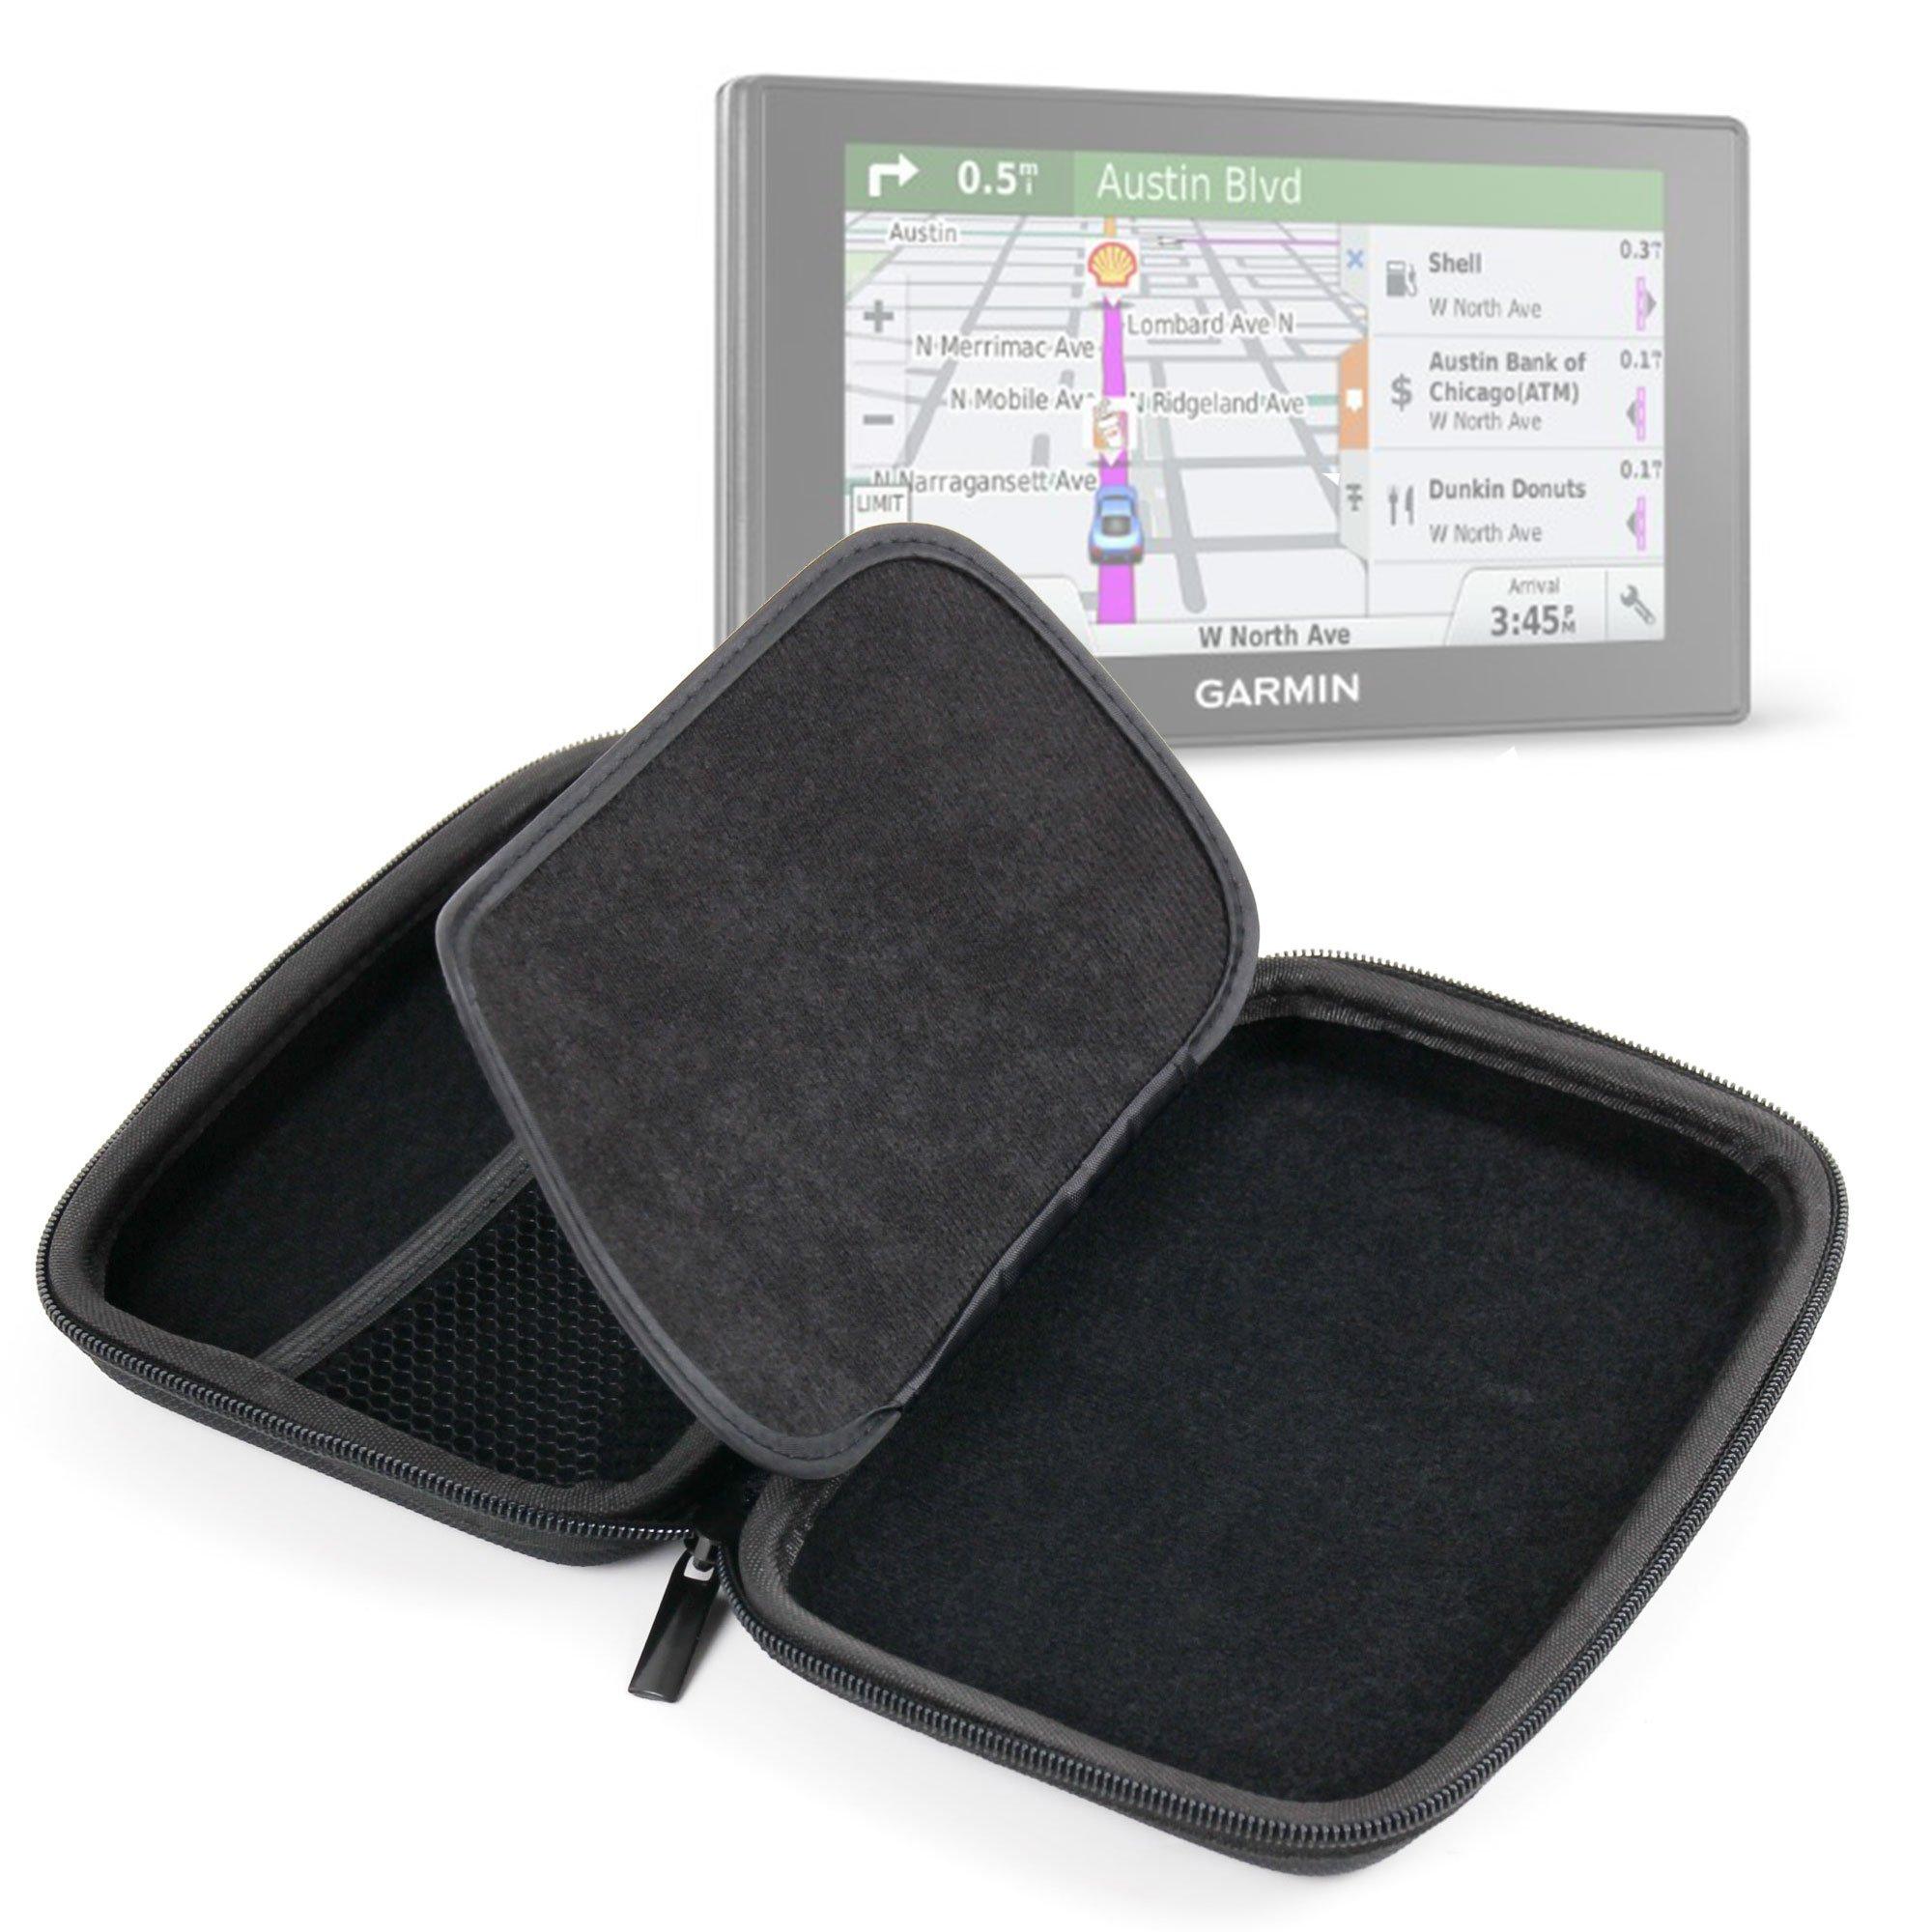 Premium Quality 7-inch Hard Shell EVA Case in Black for the NEW Garmin DriveSmart 60LMT / 70LMT Satnavs - by DURAGADGET